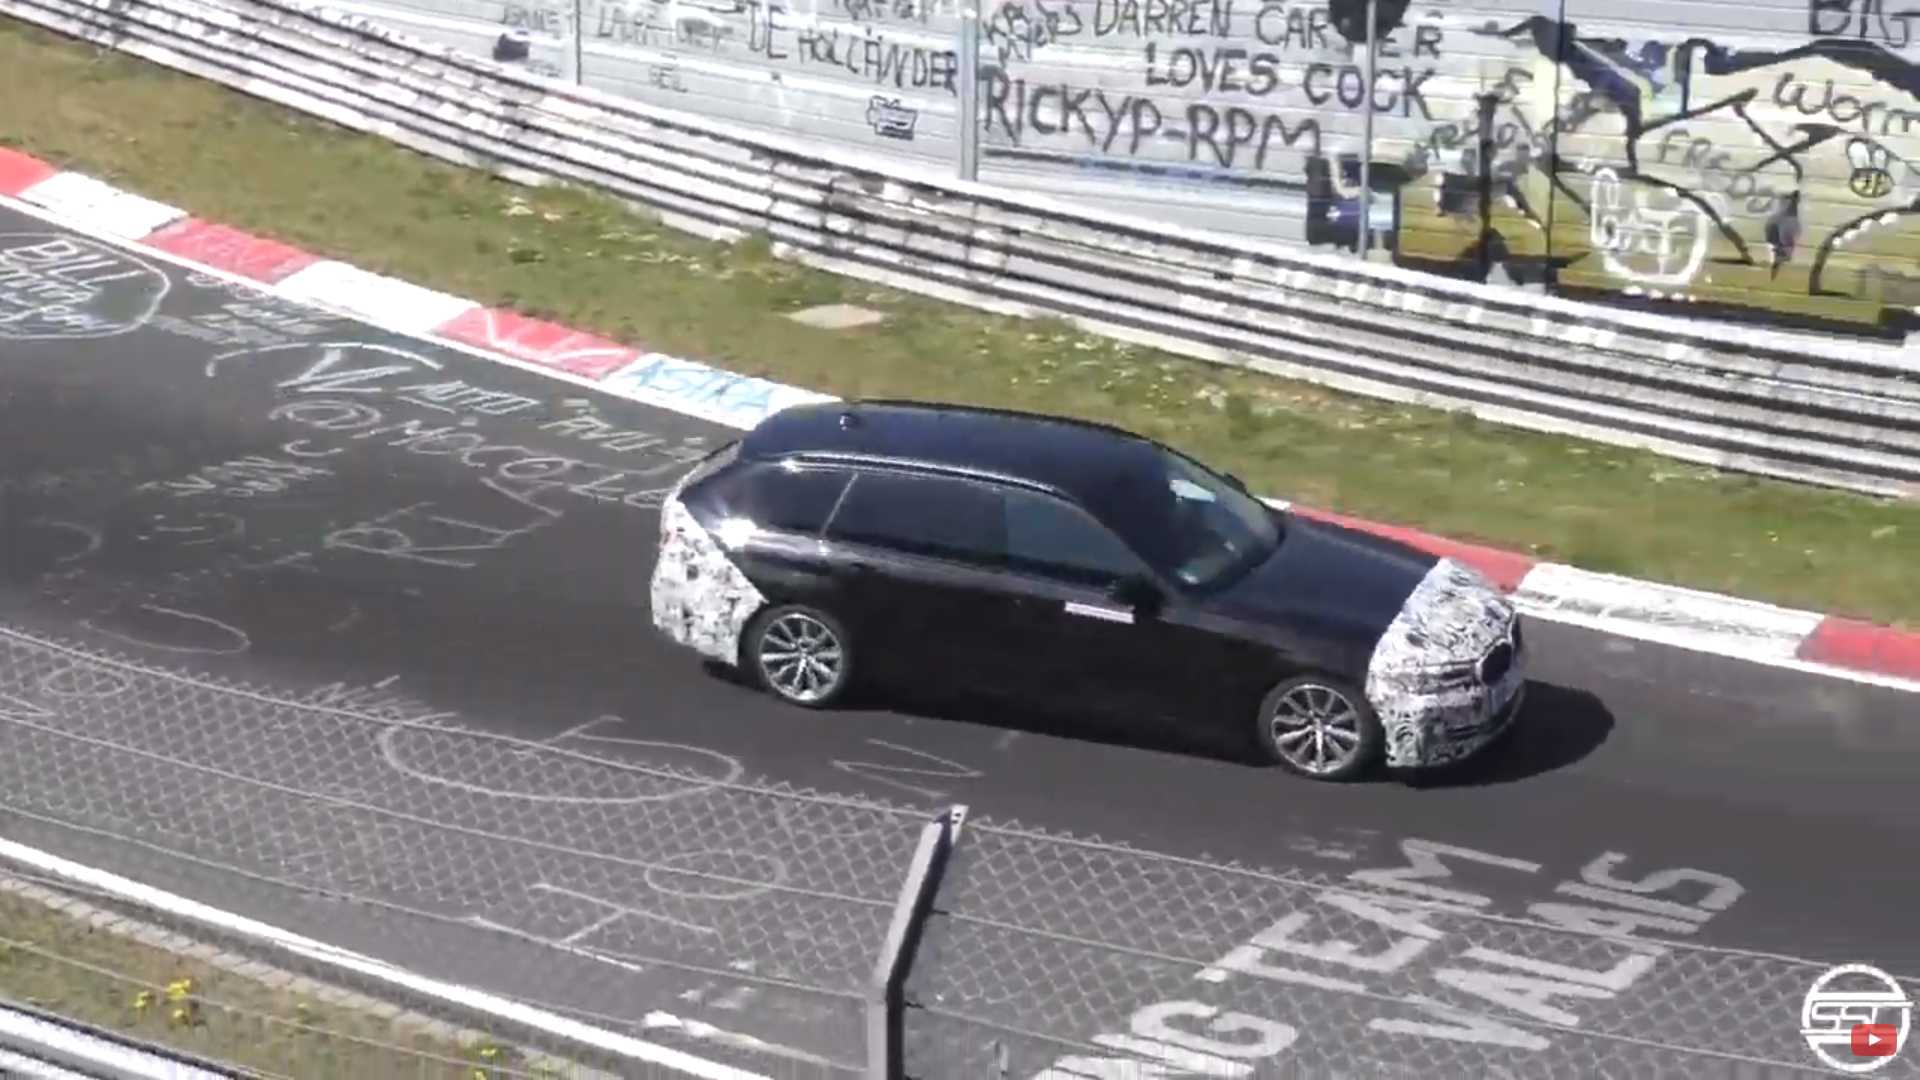 2021 Bmw 5 Series Wagon Spied Getting Sideways At The Nurburgring